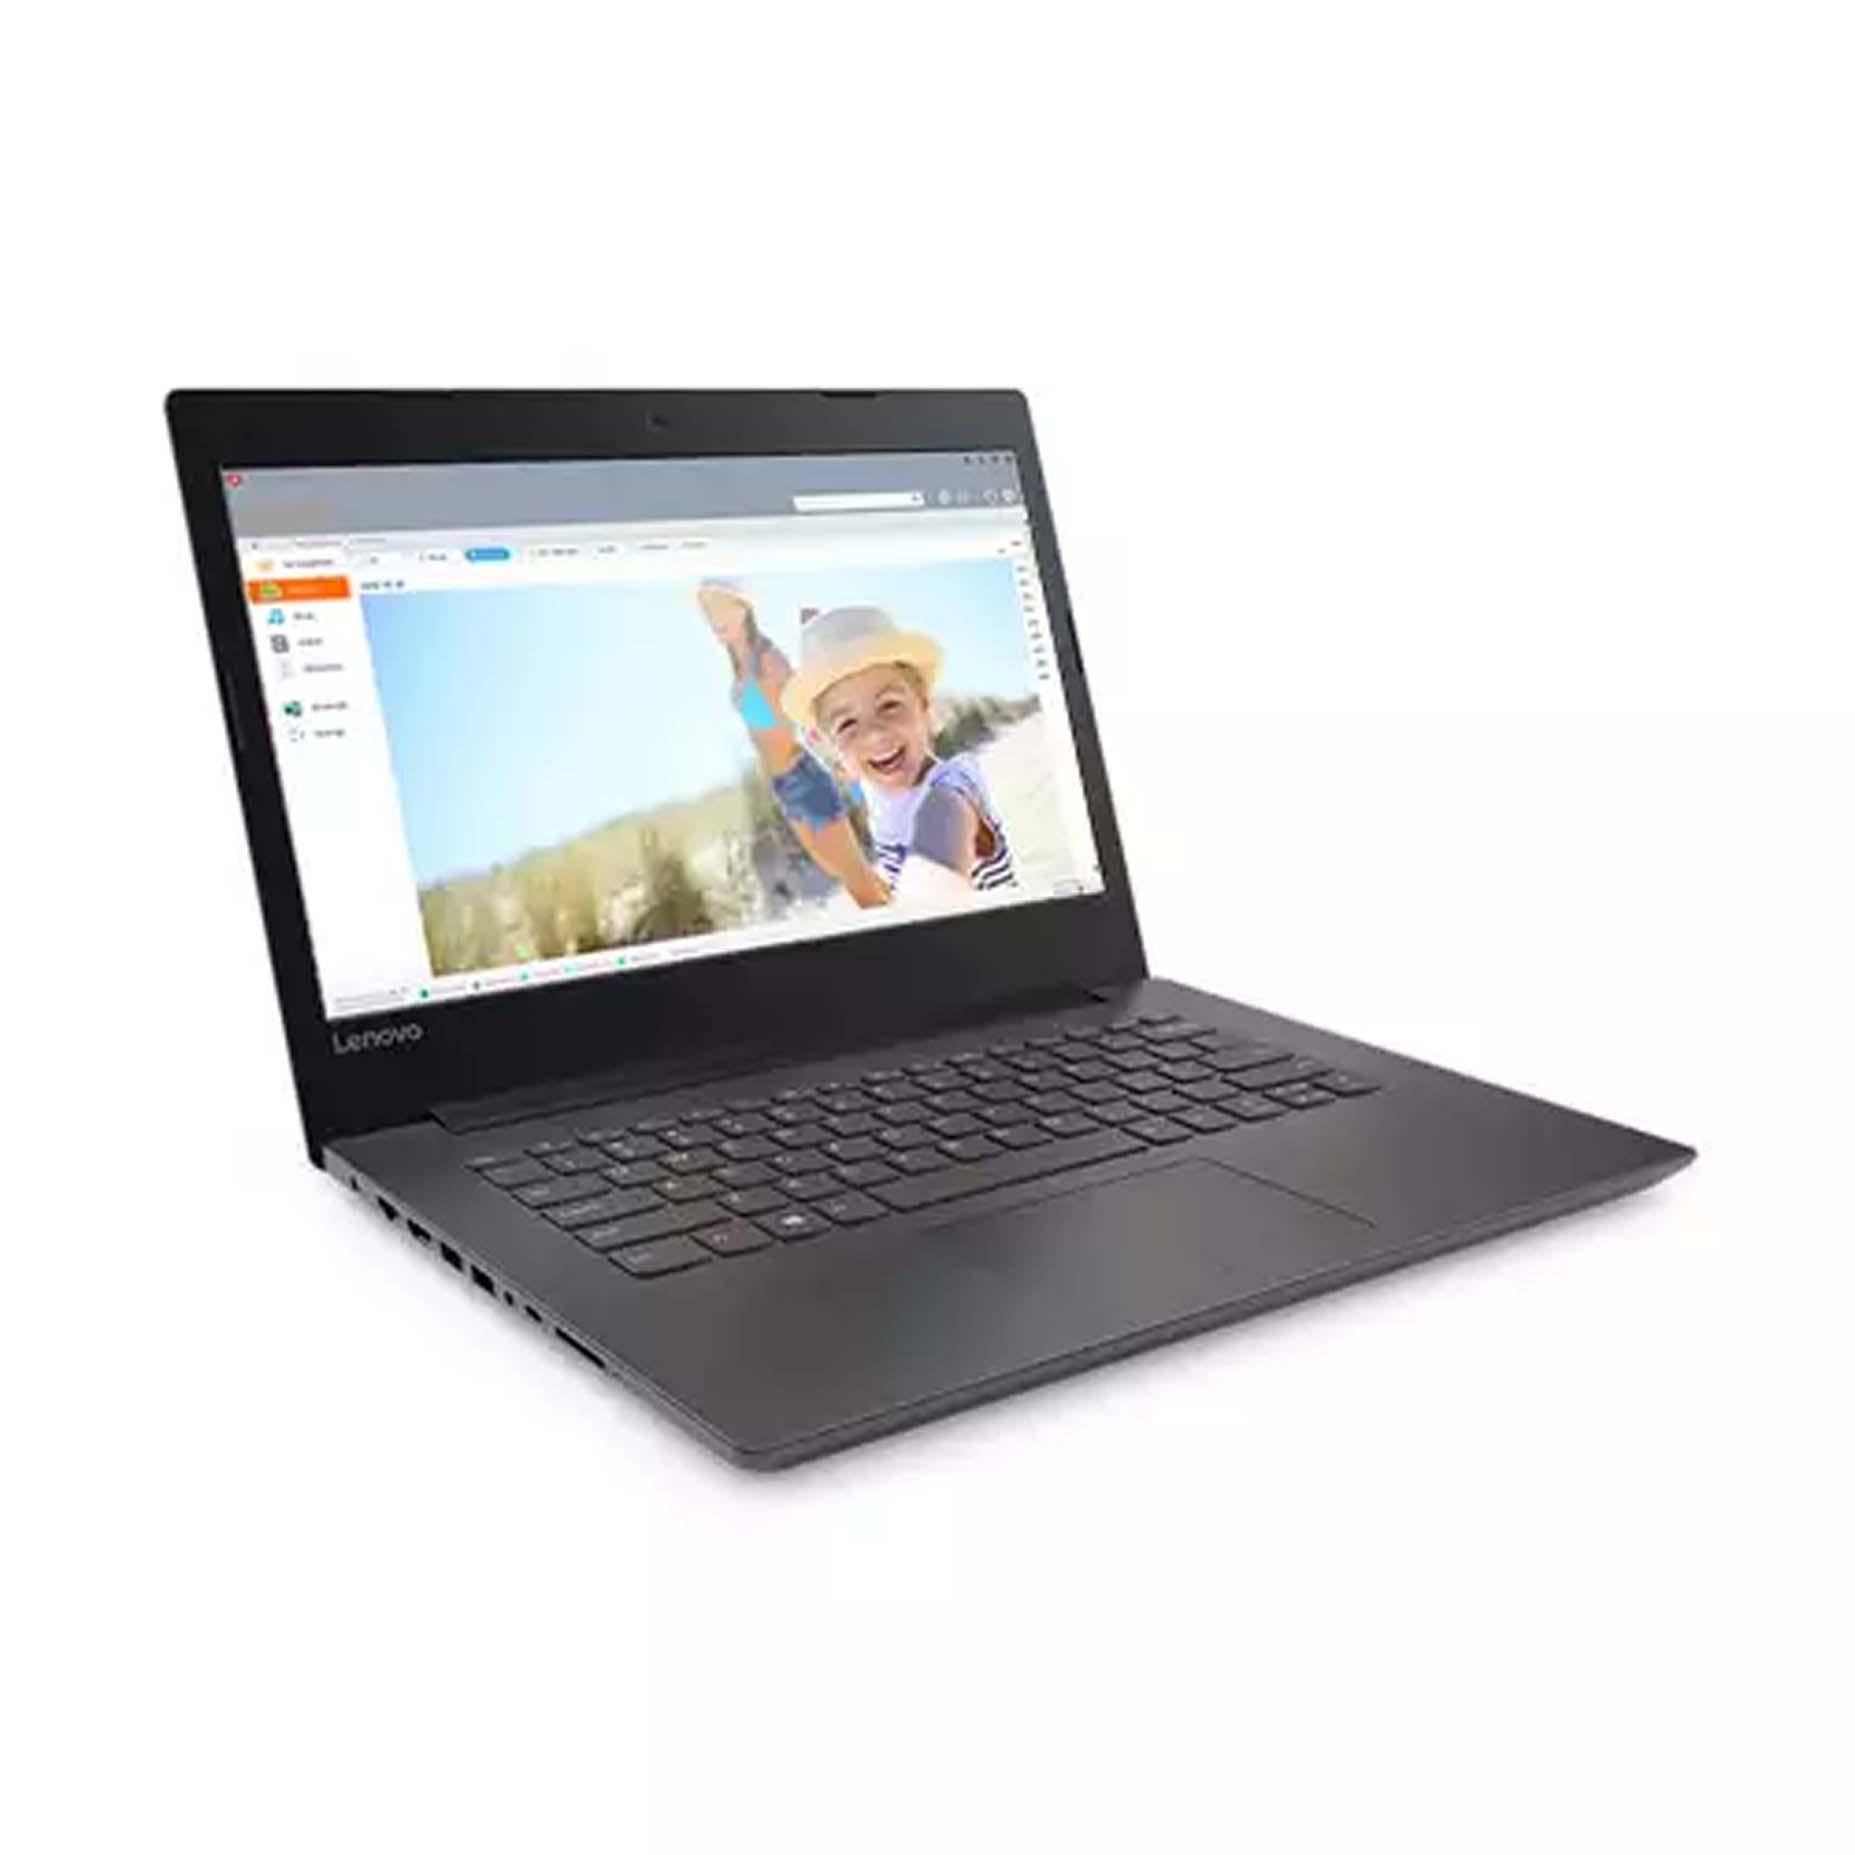 Harga Lenovo IdeaPad 330-14AST Laptop AMD A4-9125 4GB 500GB AMD Radeon R4 14 Inch Win 10 Black